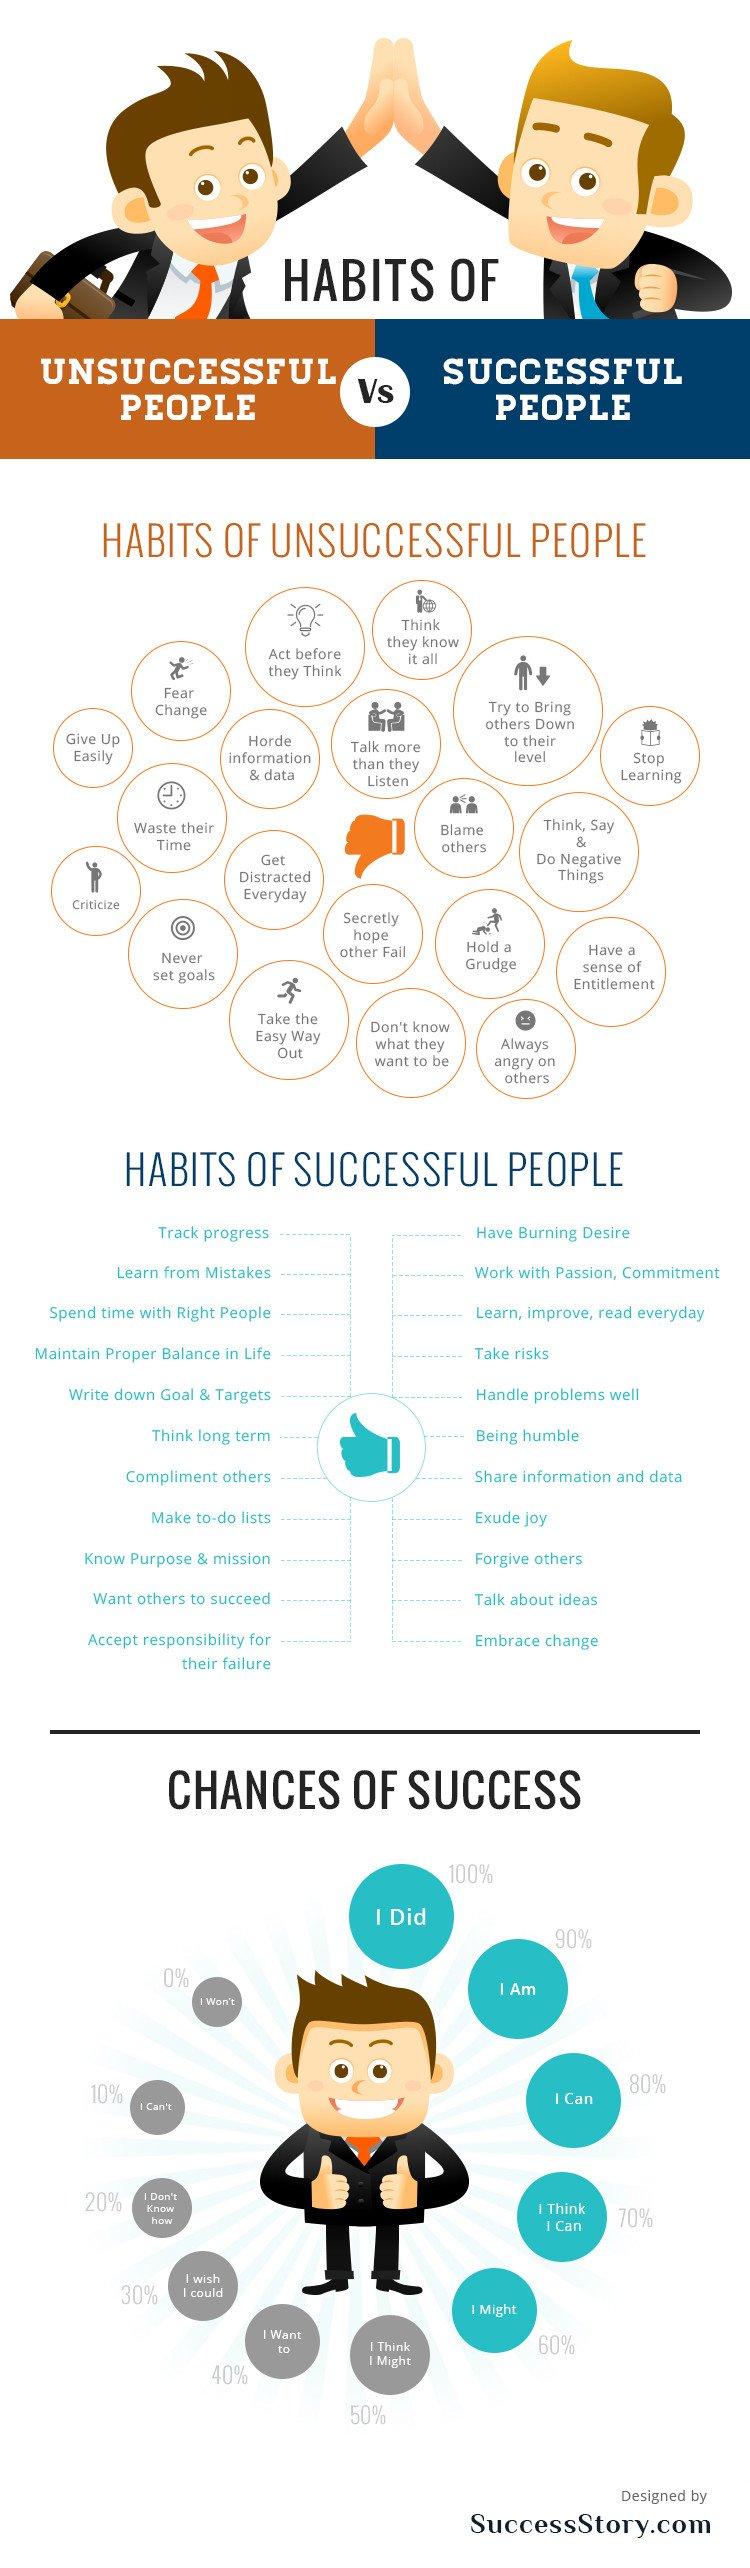 Habits Of Successful V/s UnsuccessfulPeople